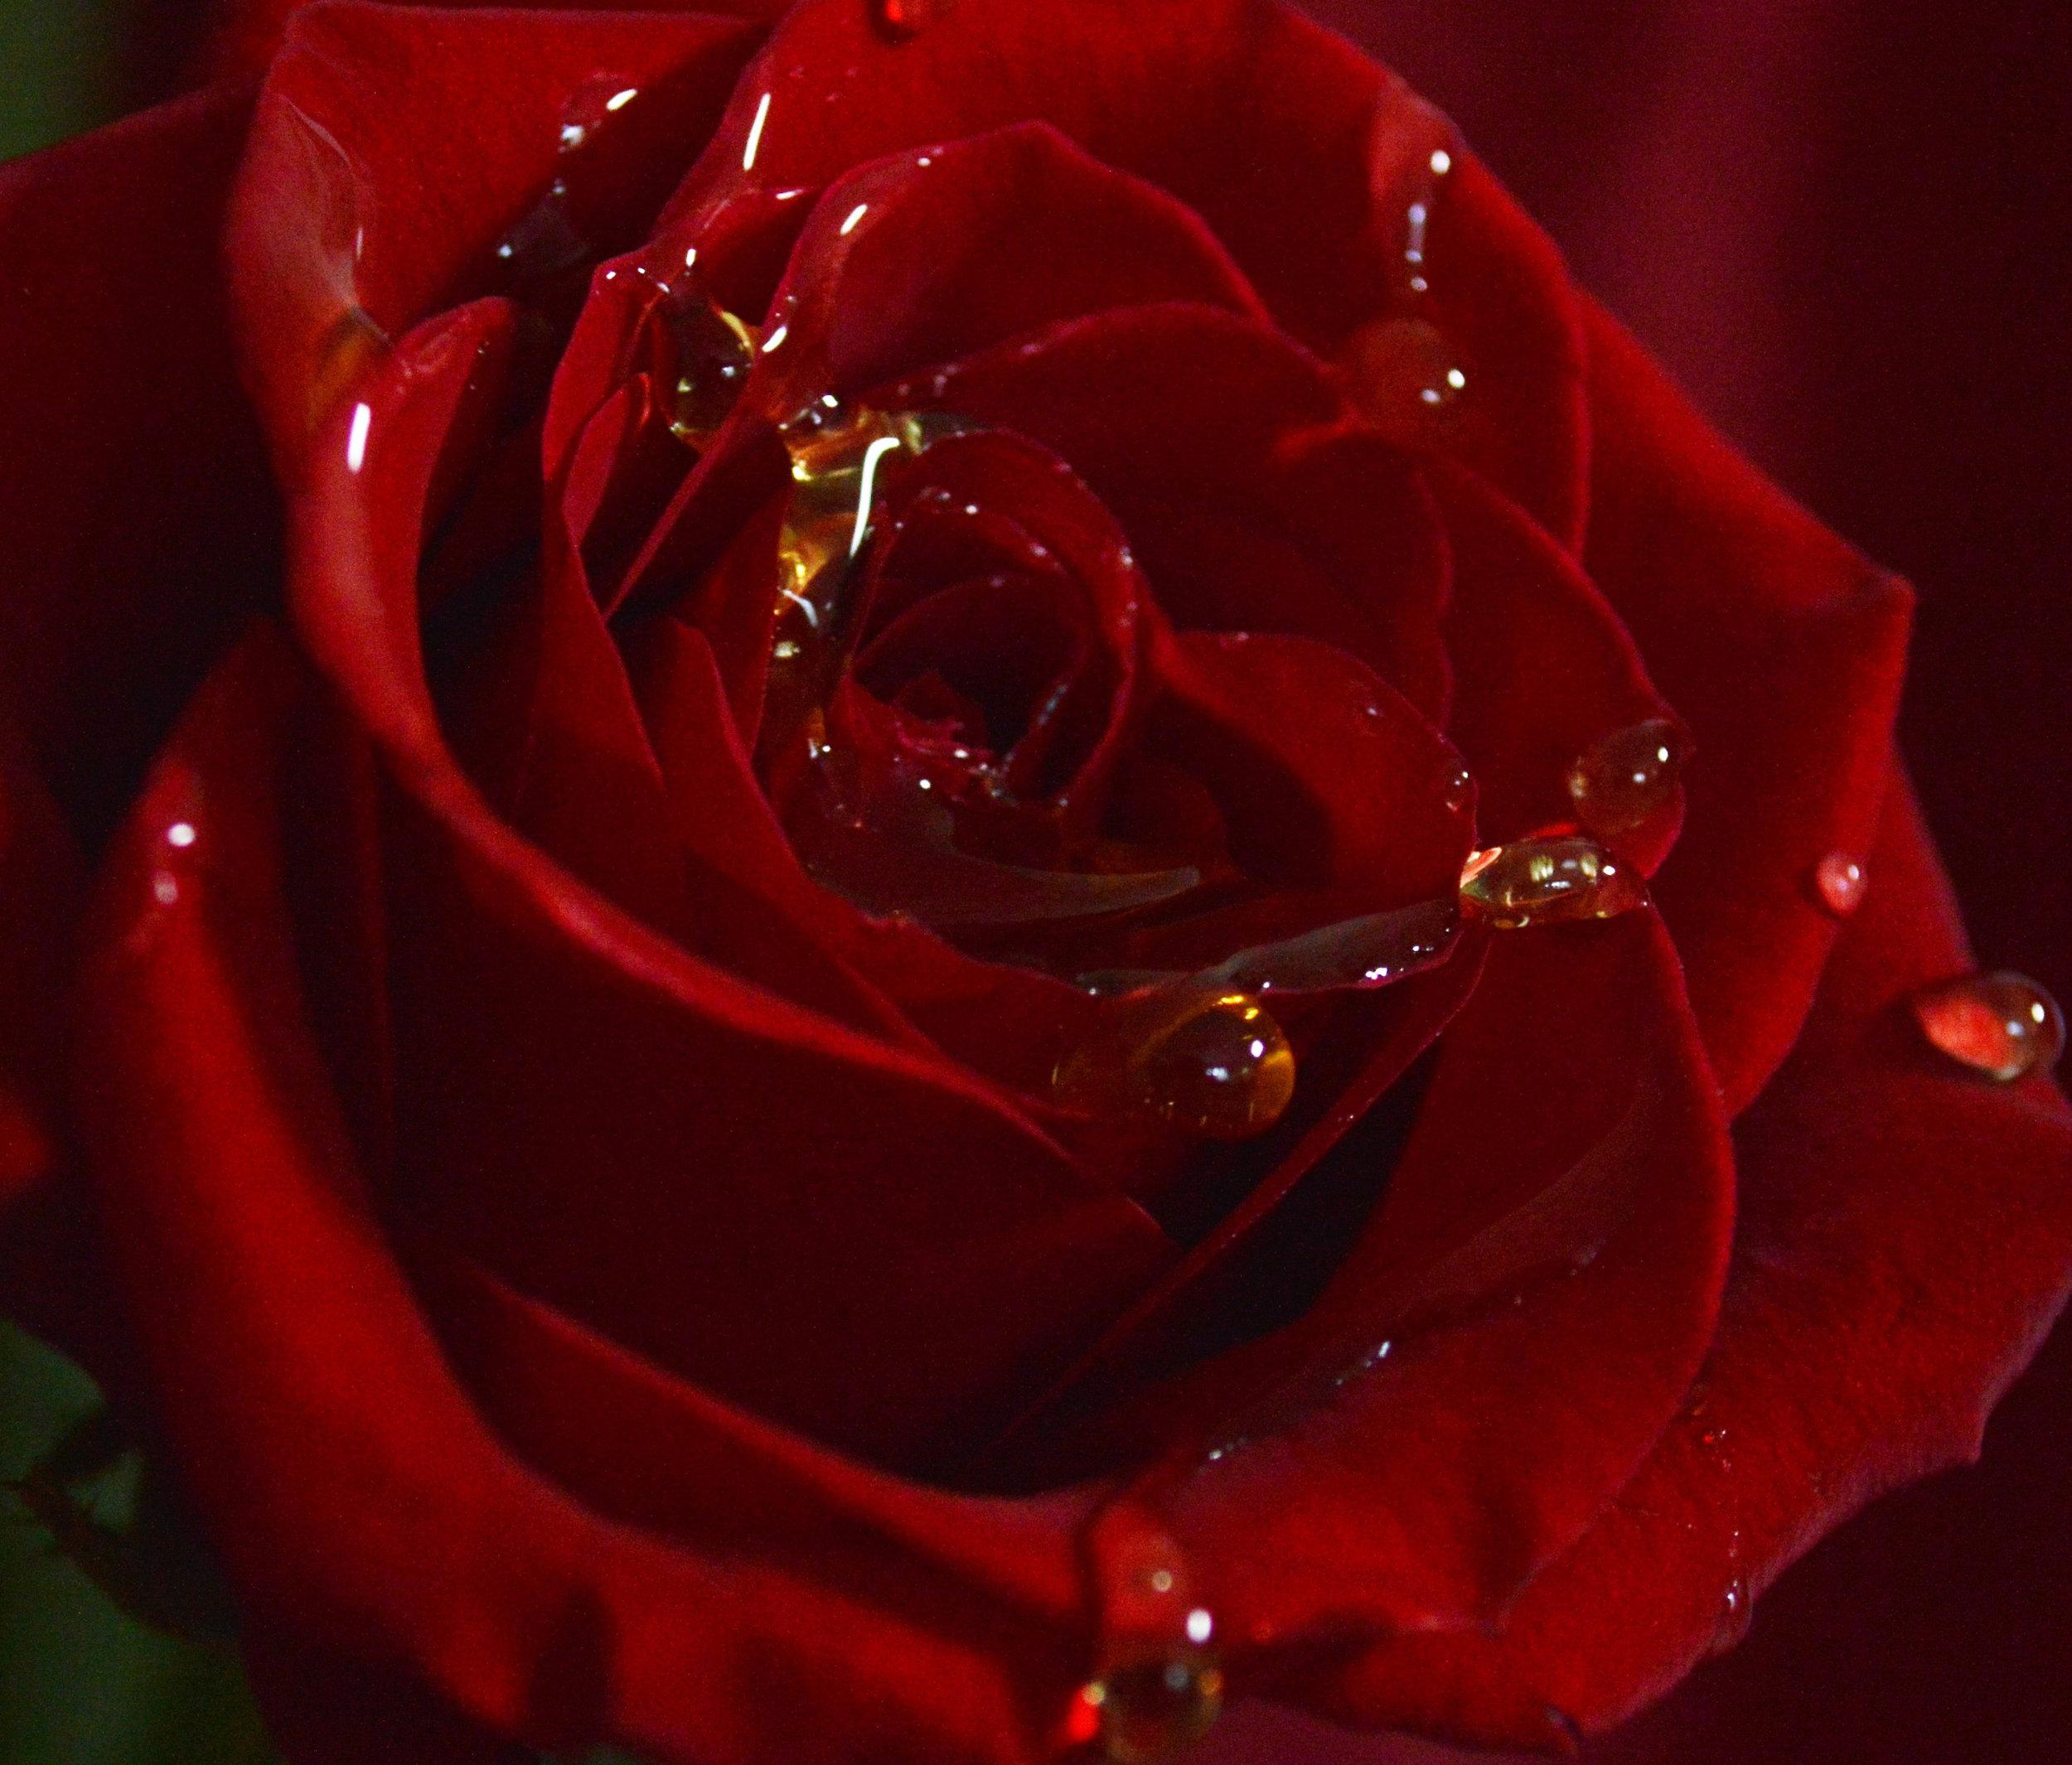 rose and honey.jpg